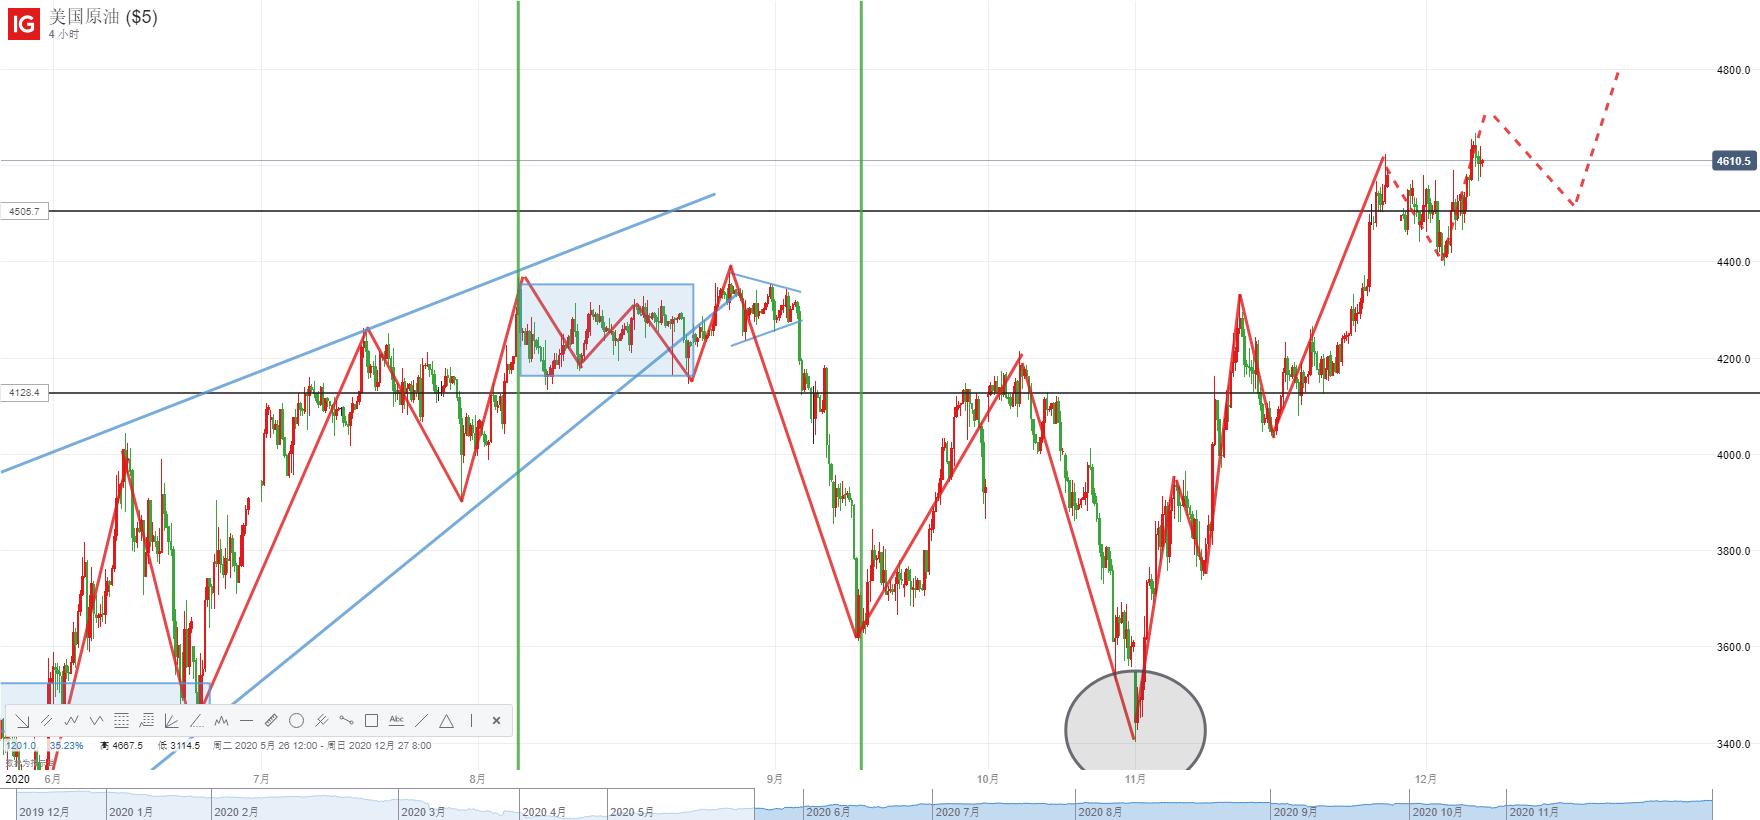 WTI原油:OPEC+增产难撼动看涨油价预期,但本周风险情绪存一大悬念!